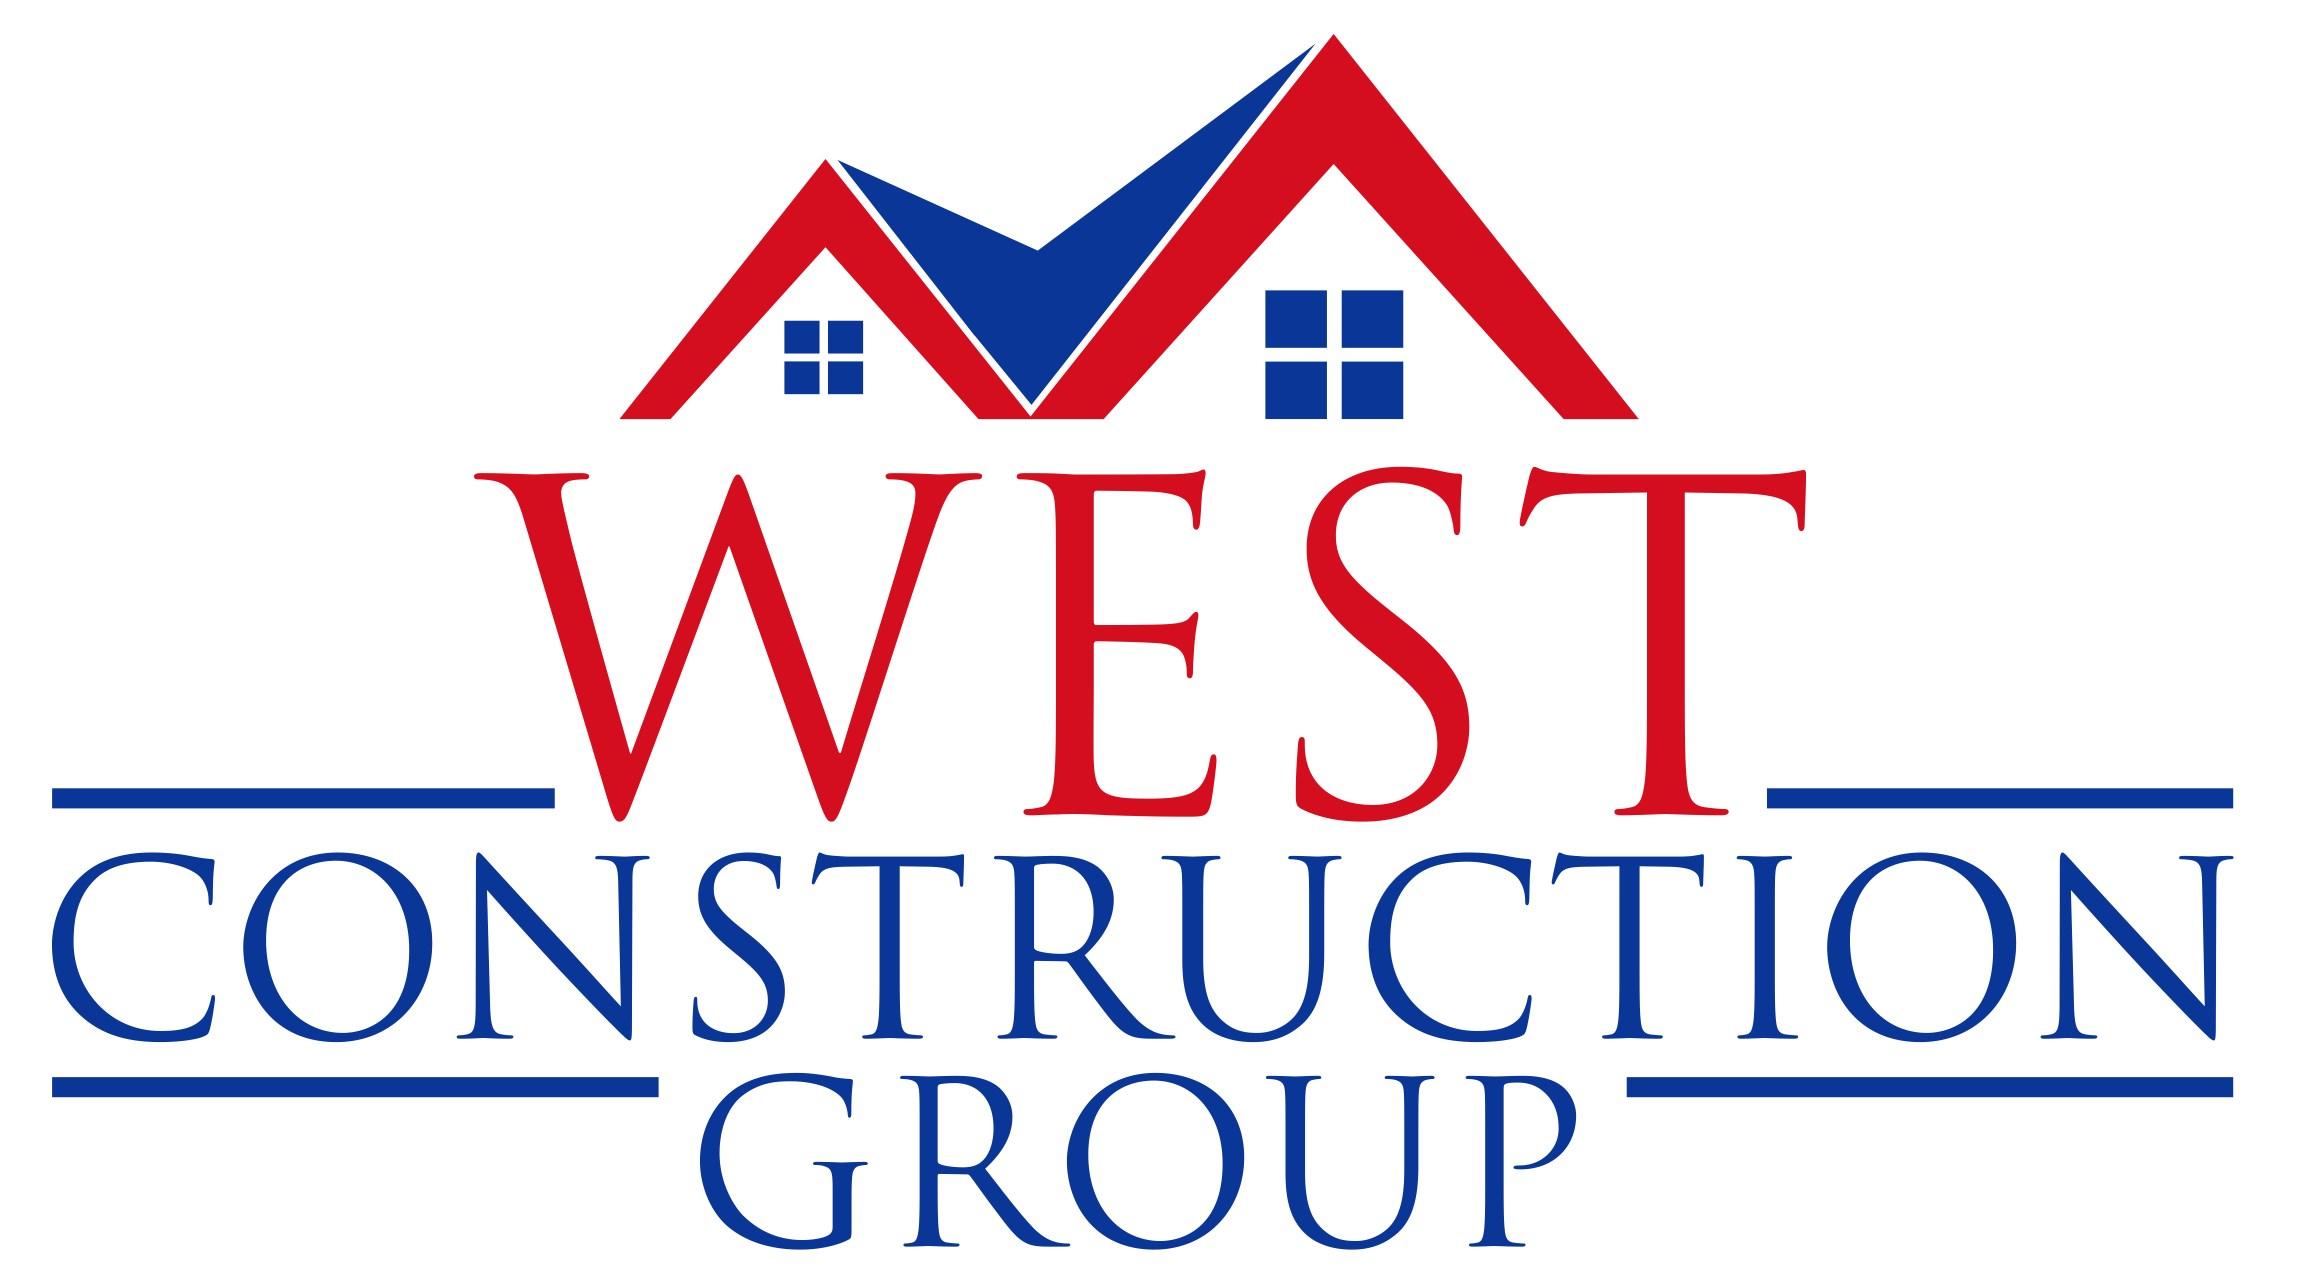 West Construction Group